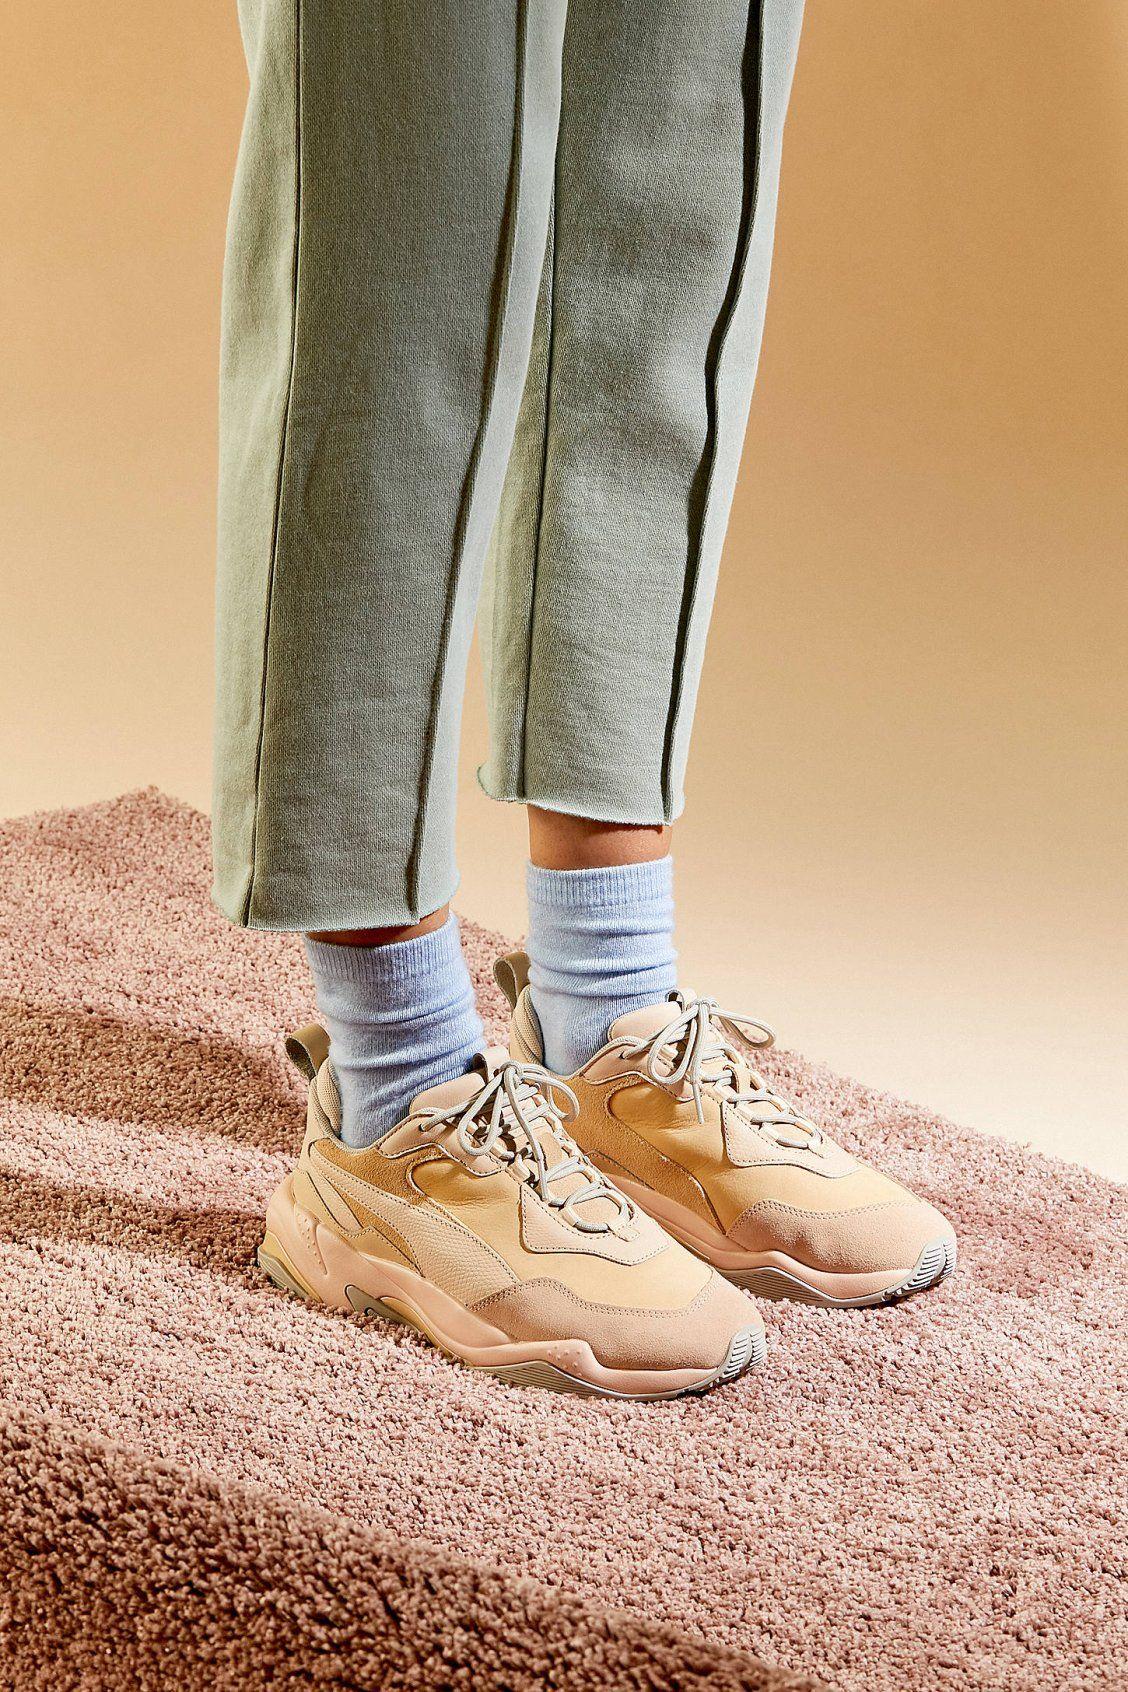 Puma Thunder Desert Sneaker | Nike sneakers outfit, Adidas ...